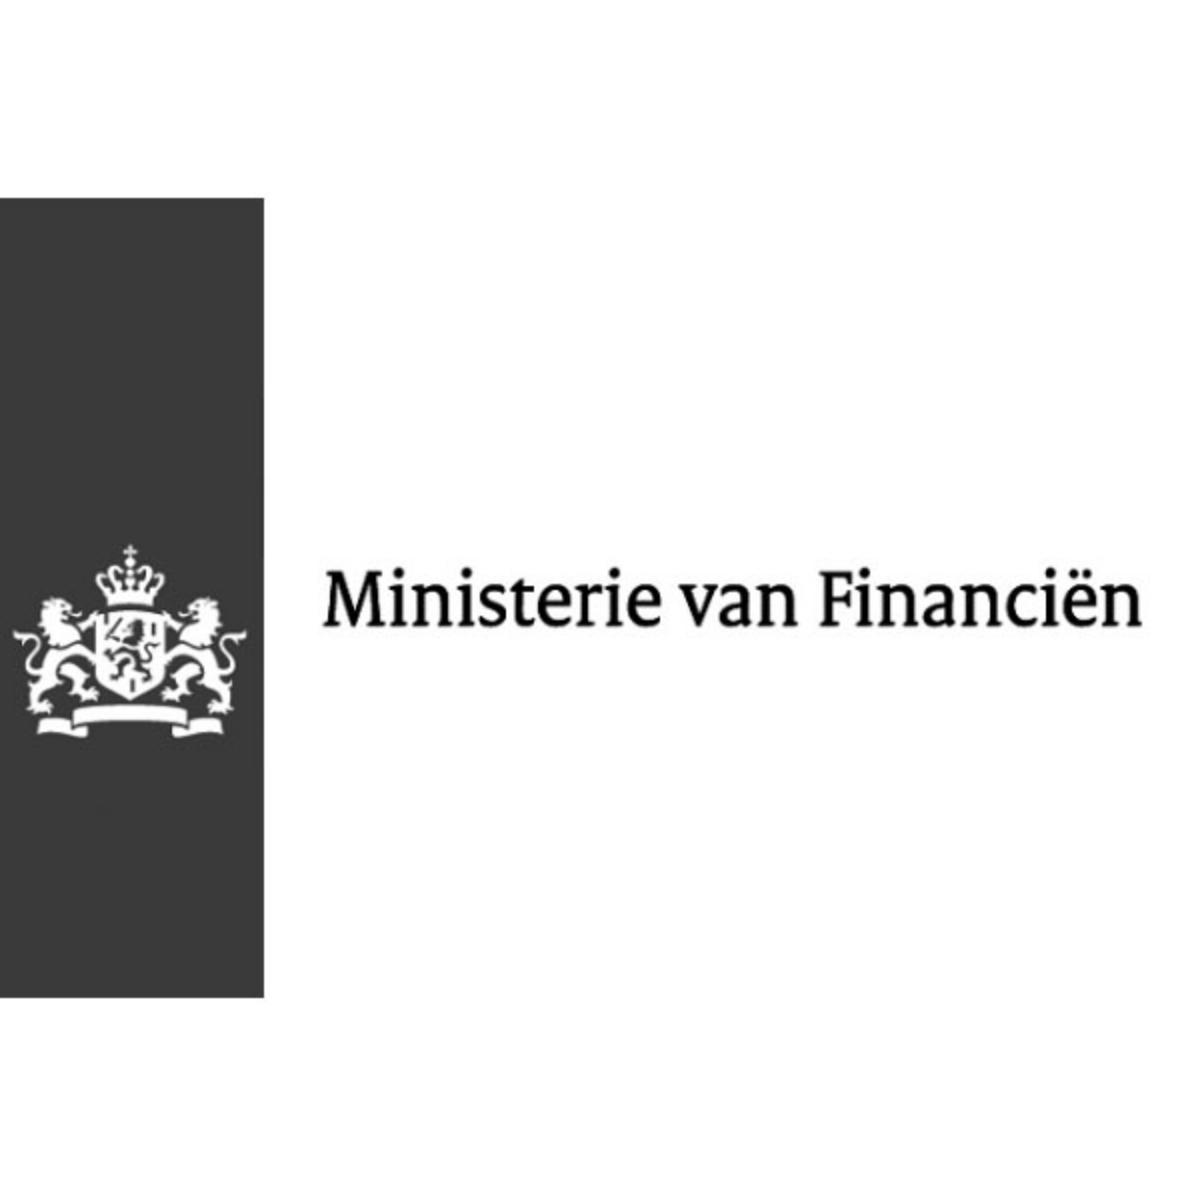 Financial trainee Ministerie van Financiën